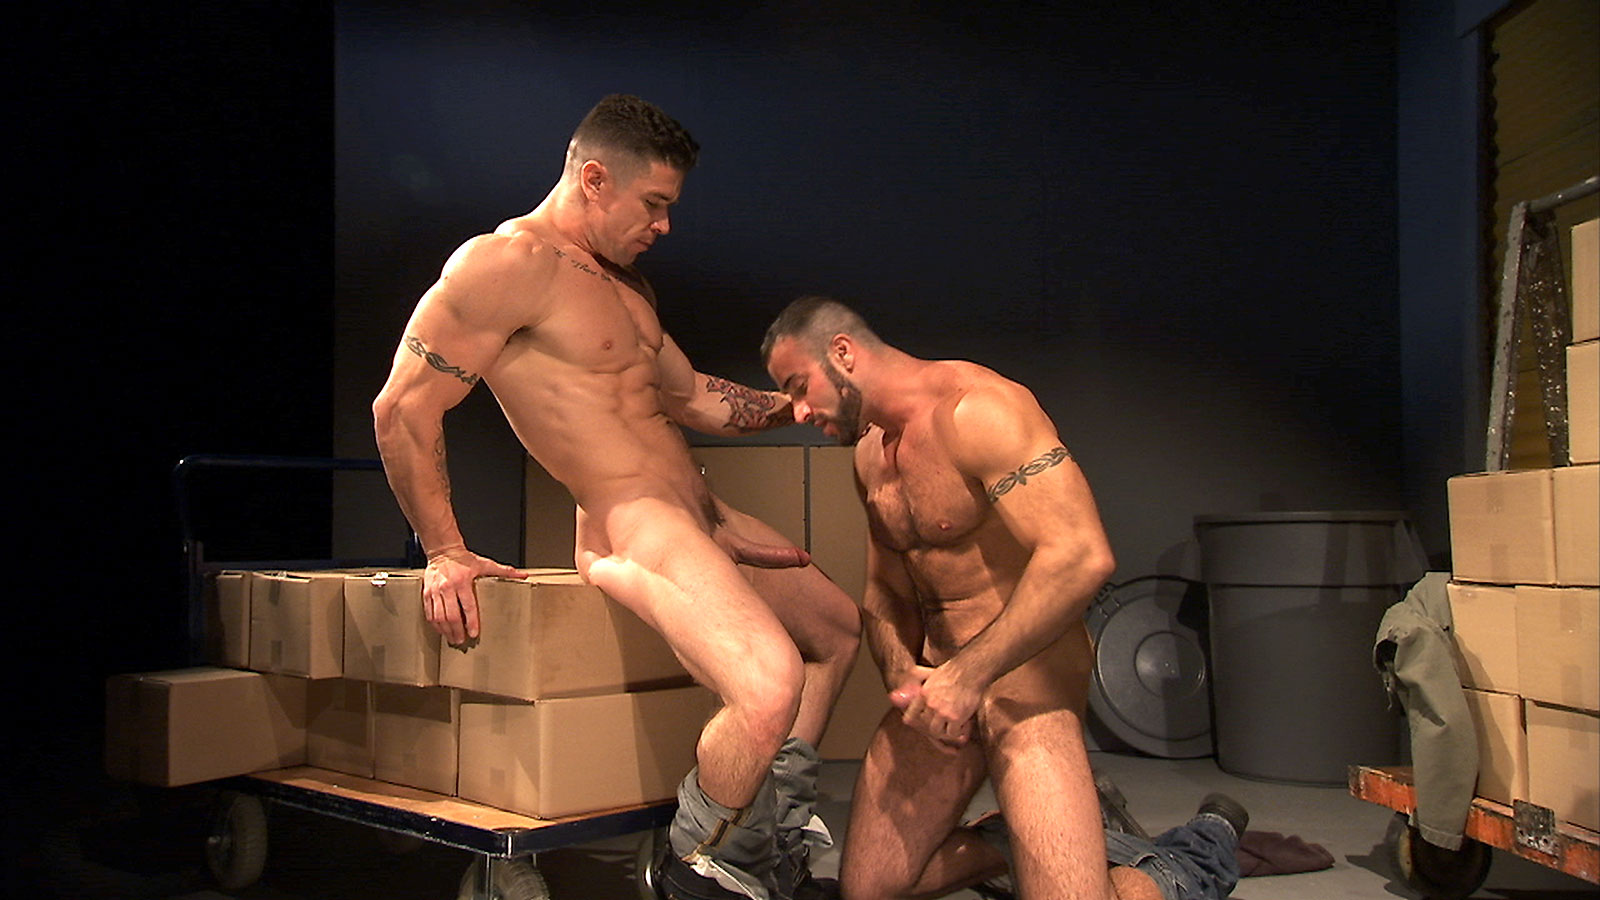 porn md raw black gay barebackers in full scenes